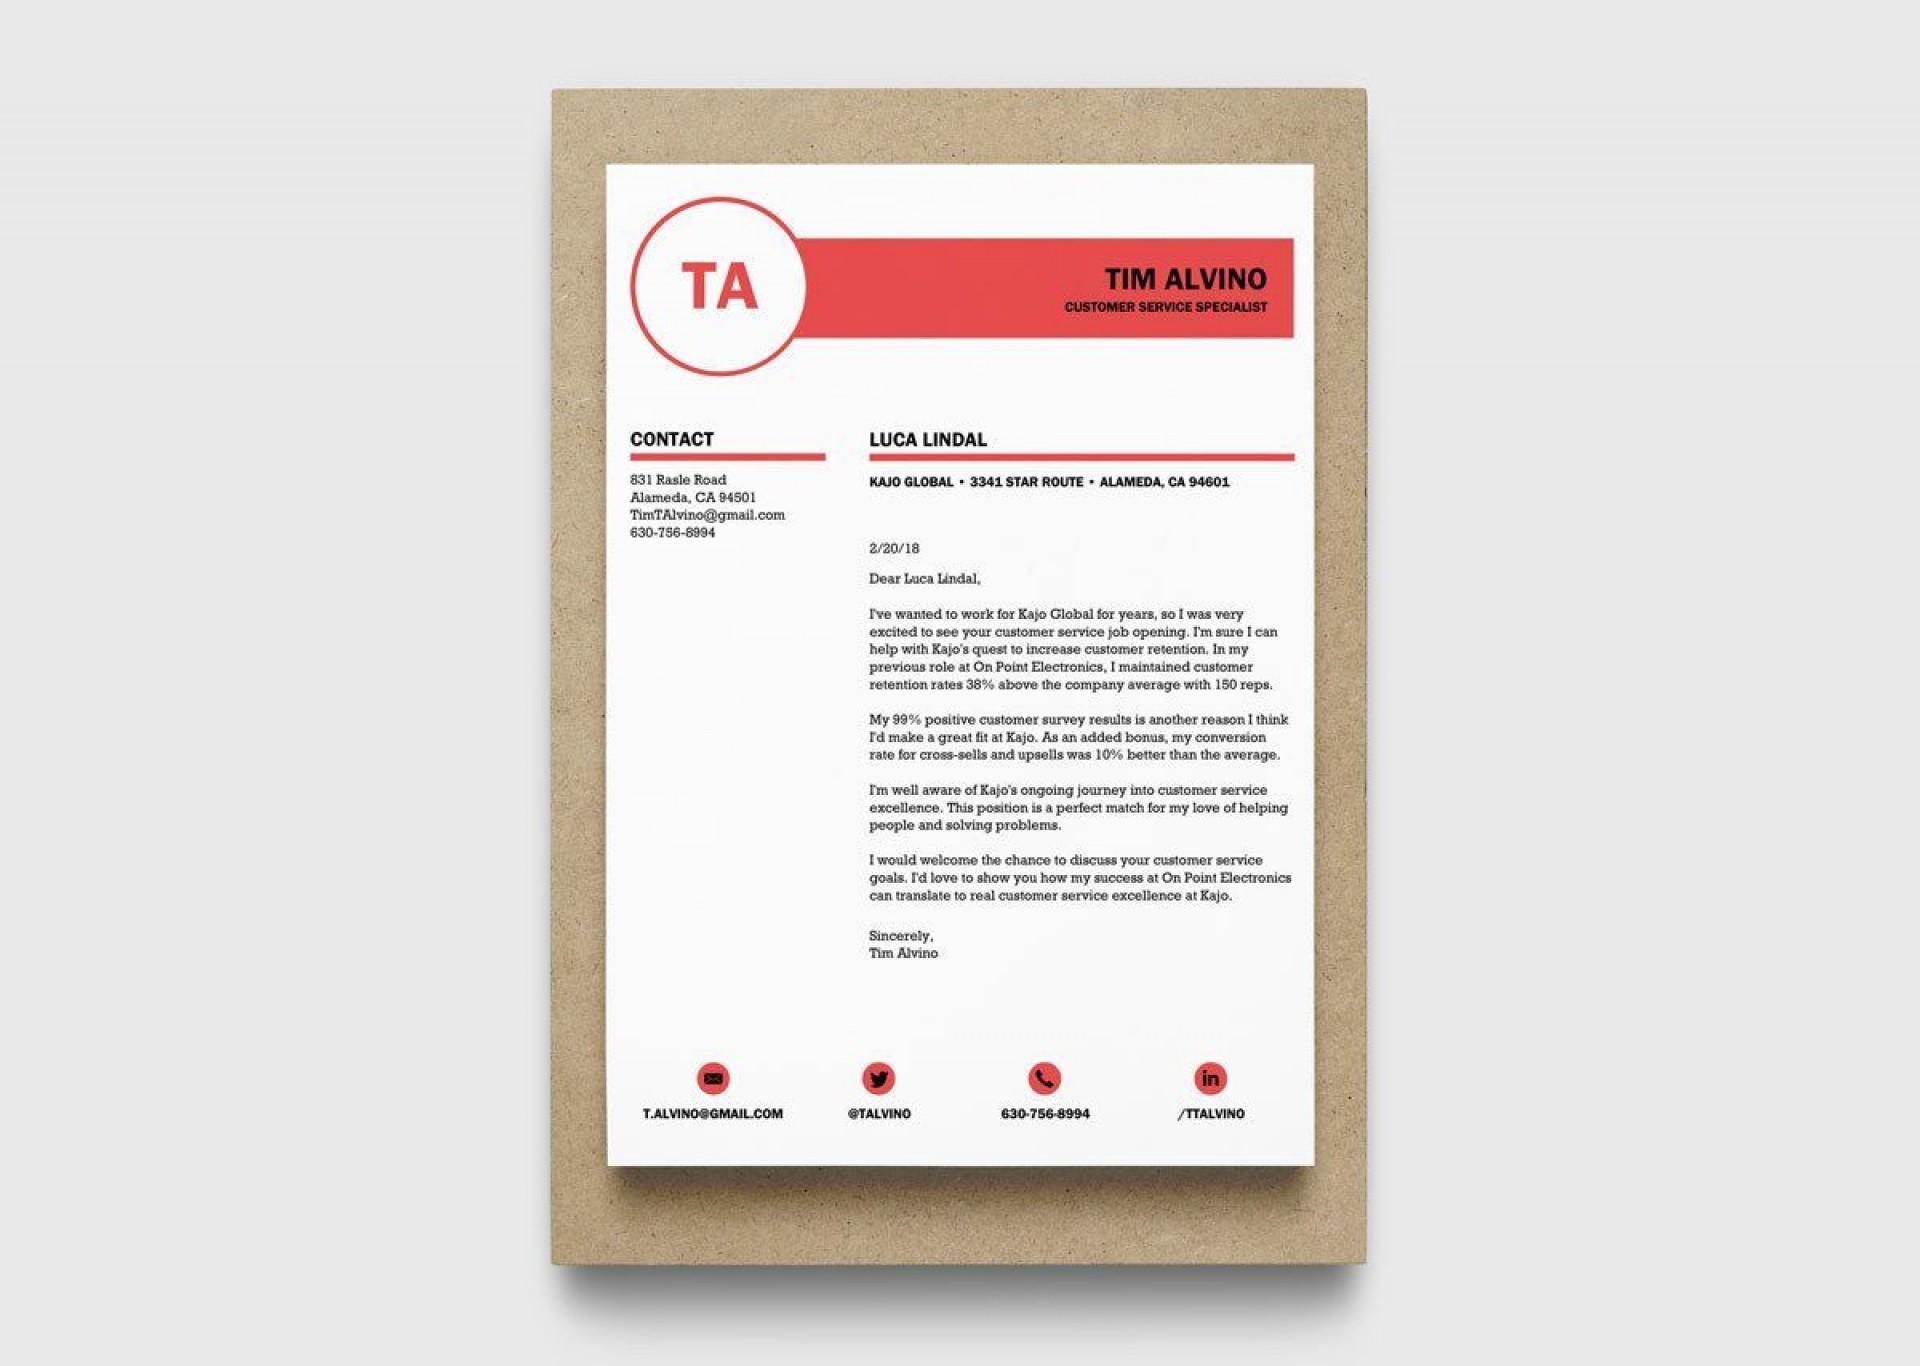 005 Wondrou Resume Cover Letter Template Microsoft Word Design 1920